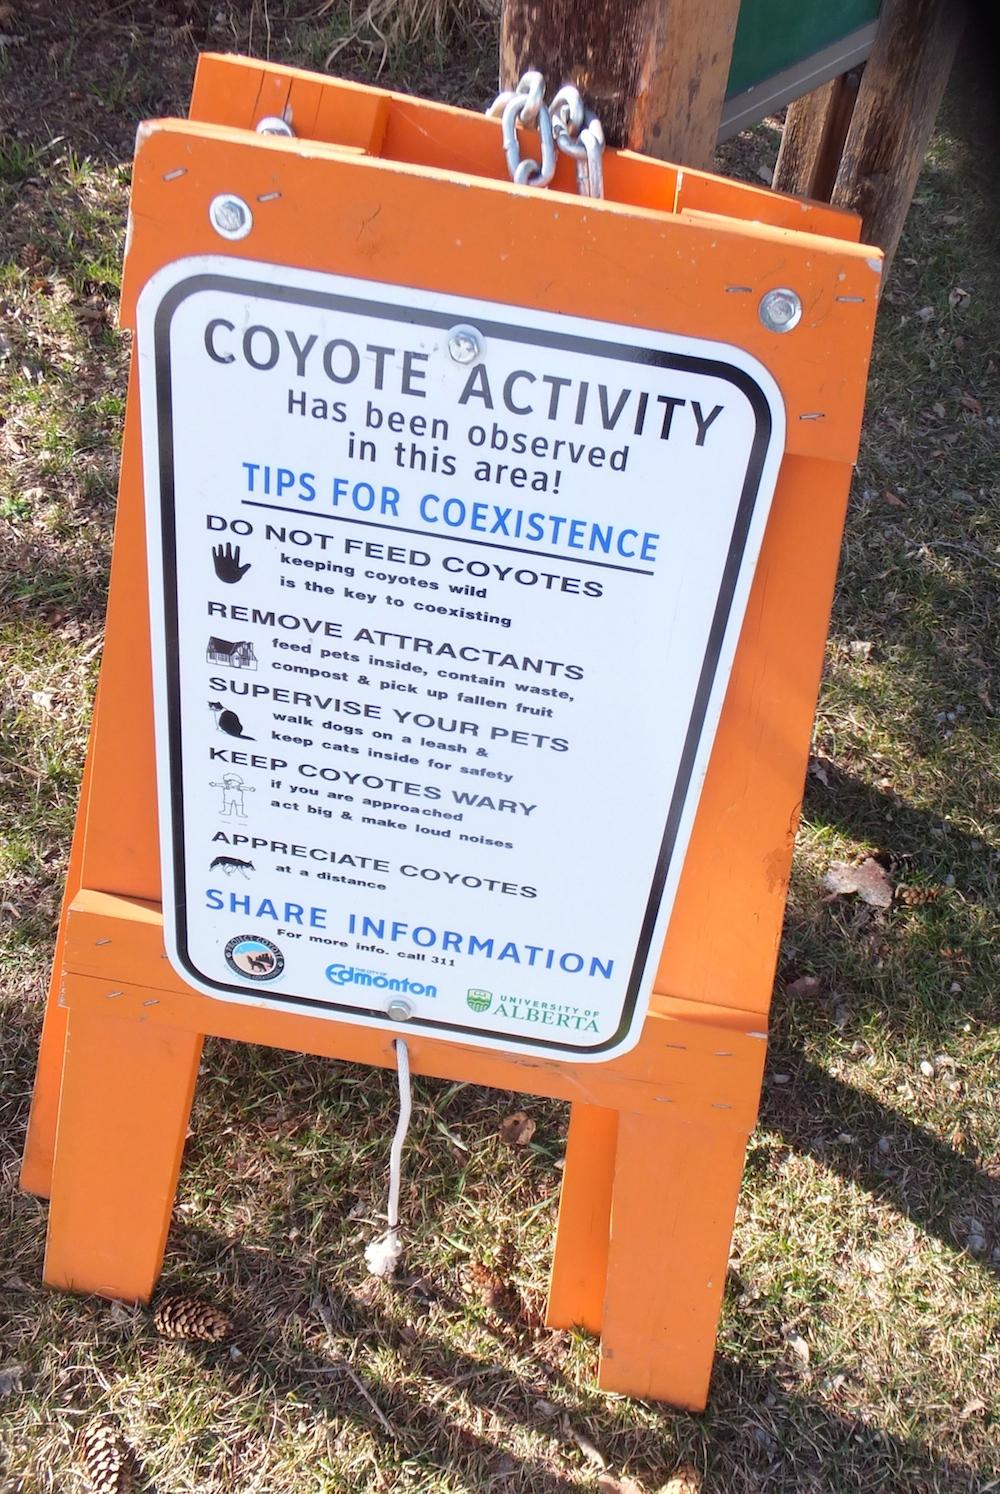 Coyote-friendly sign in Glenora